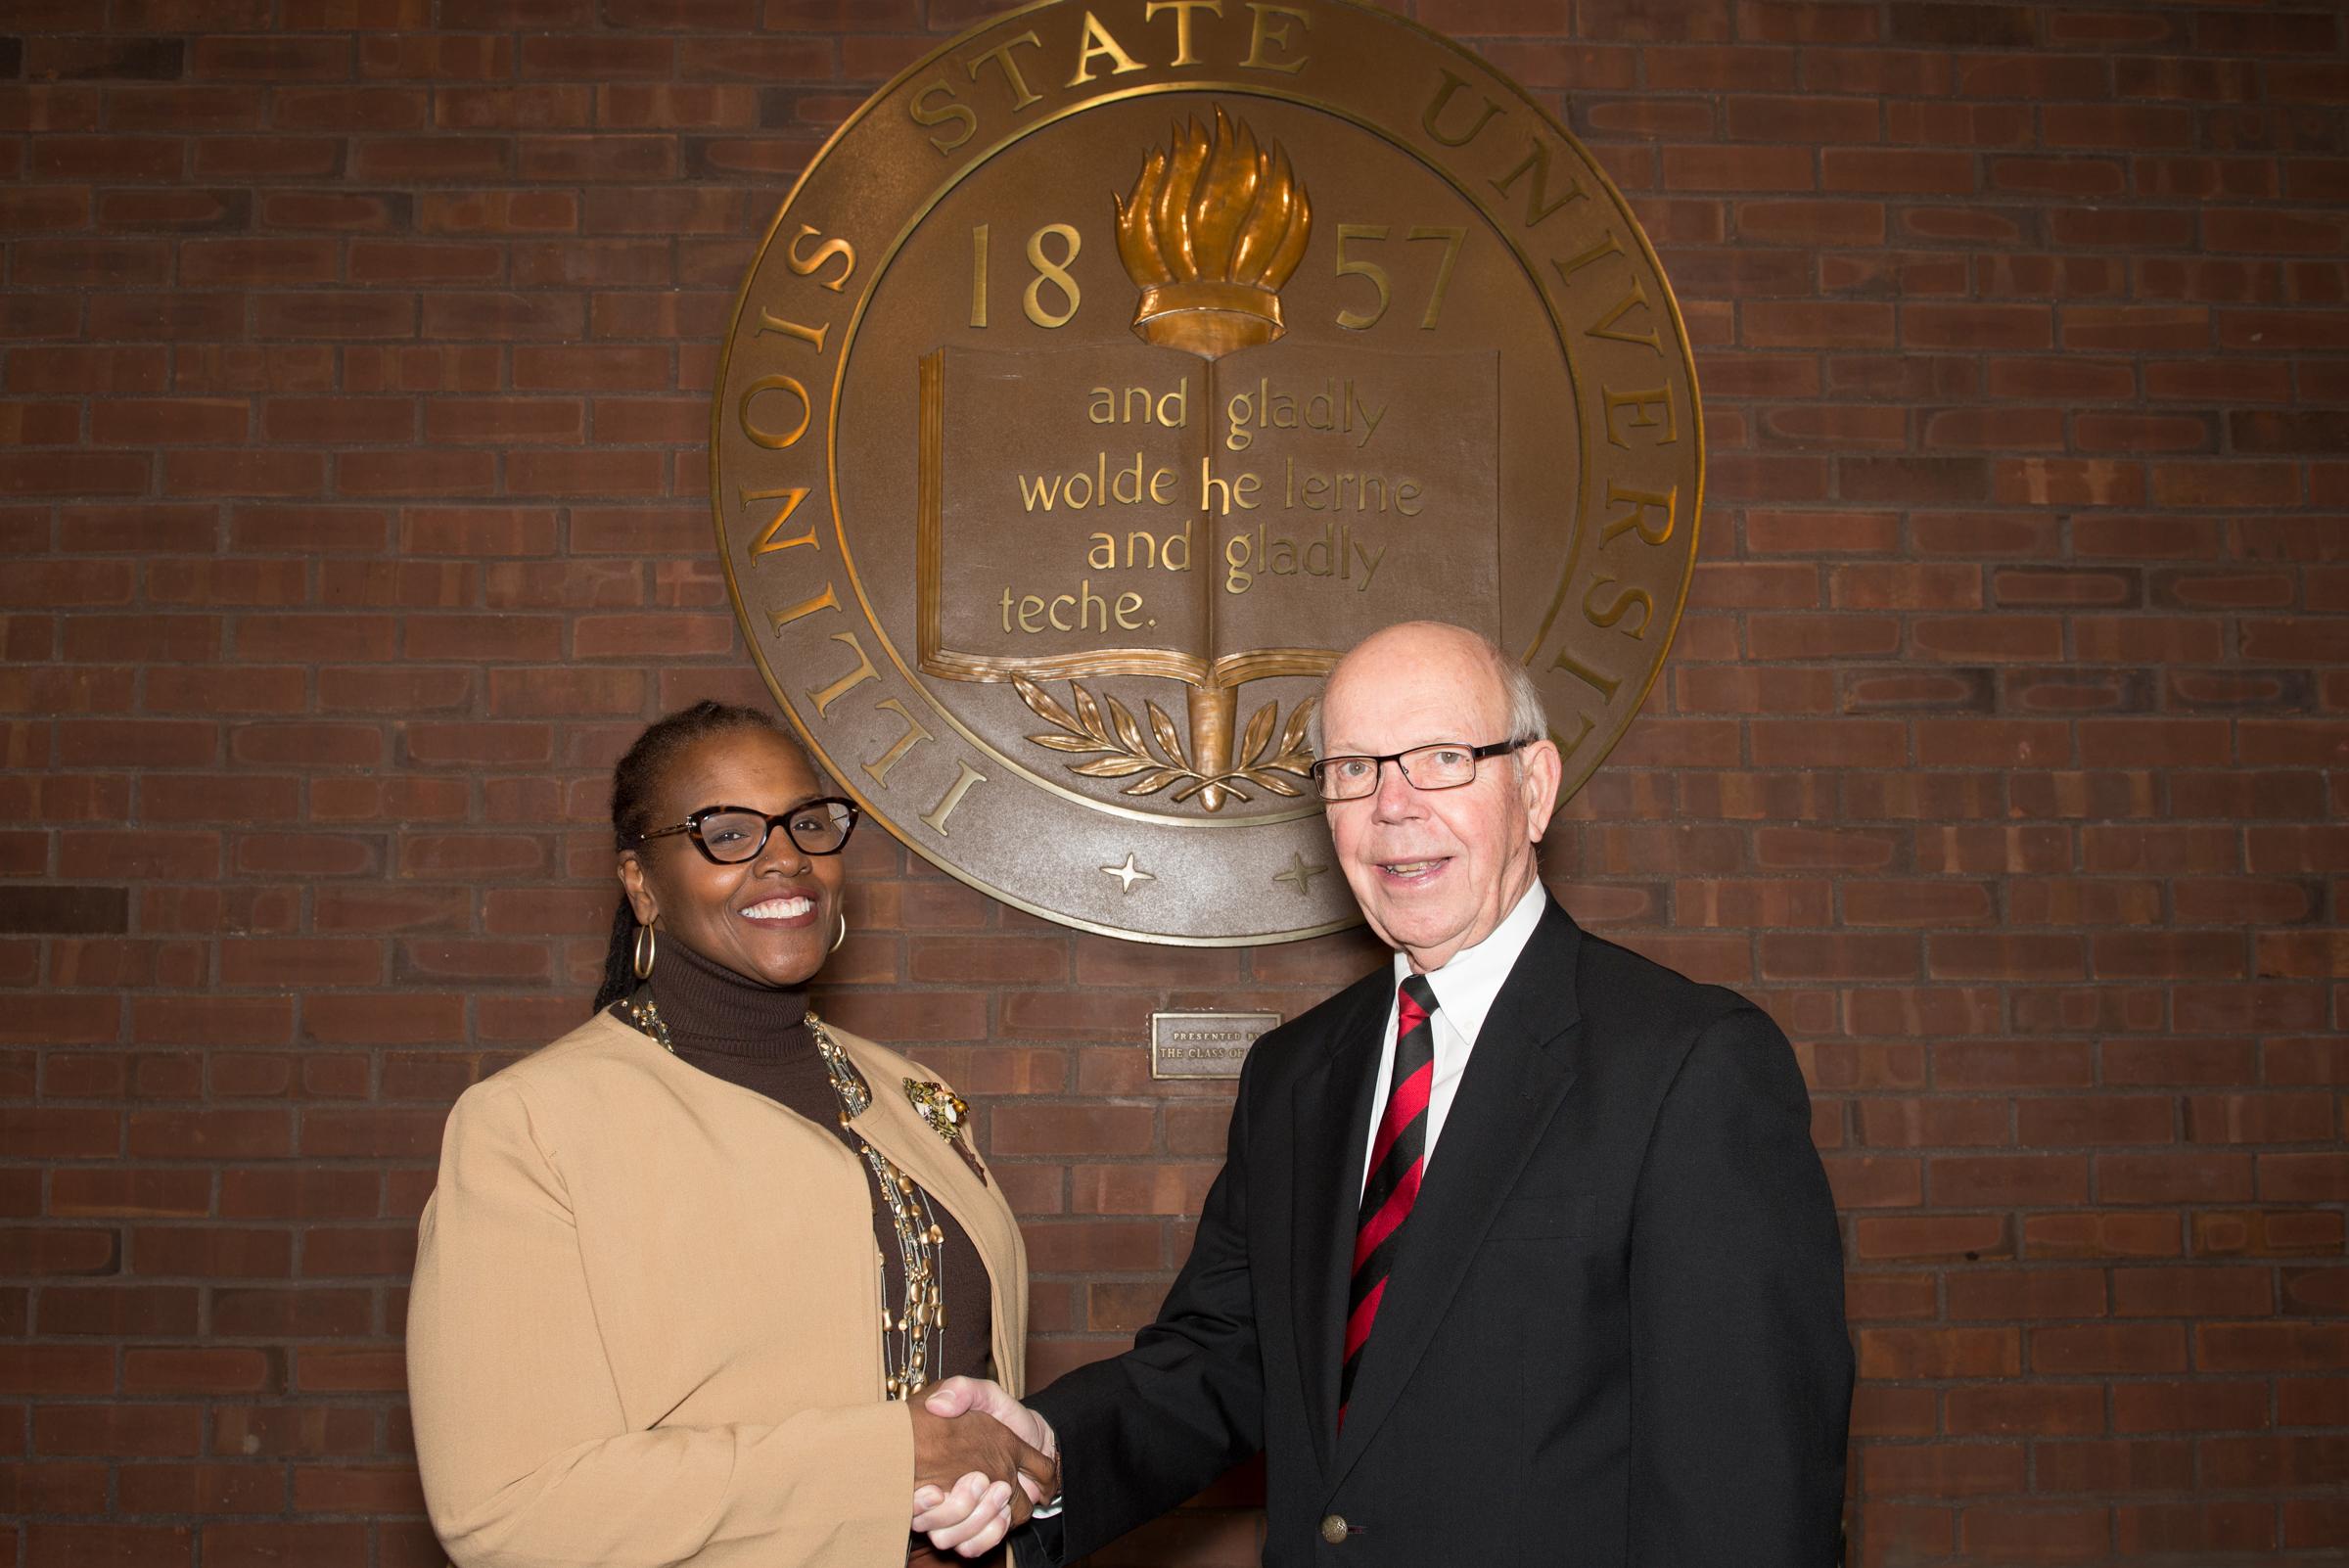 Pamela Hoff and former Illinois State University President David Strand